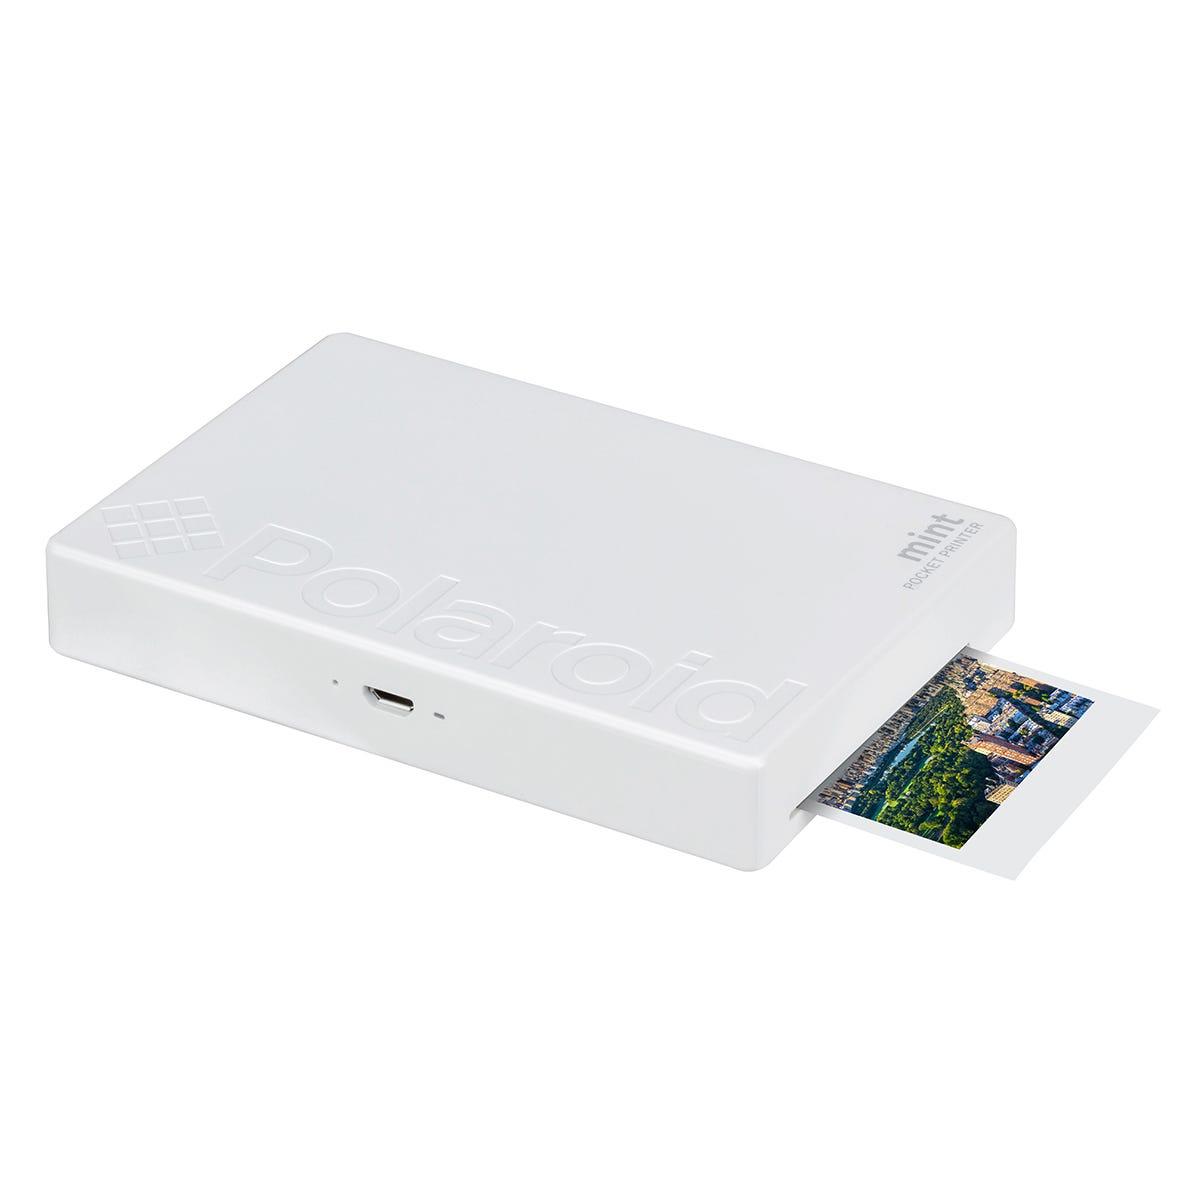 Polaroid Mint Instant Printer - White